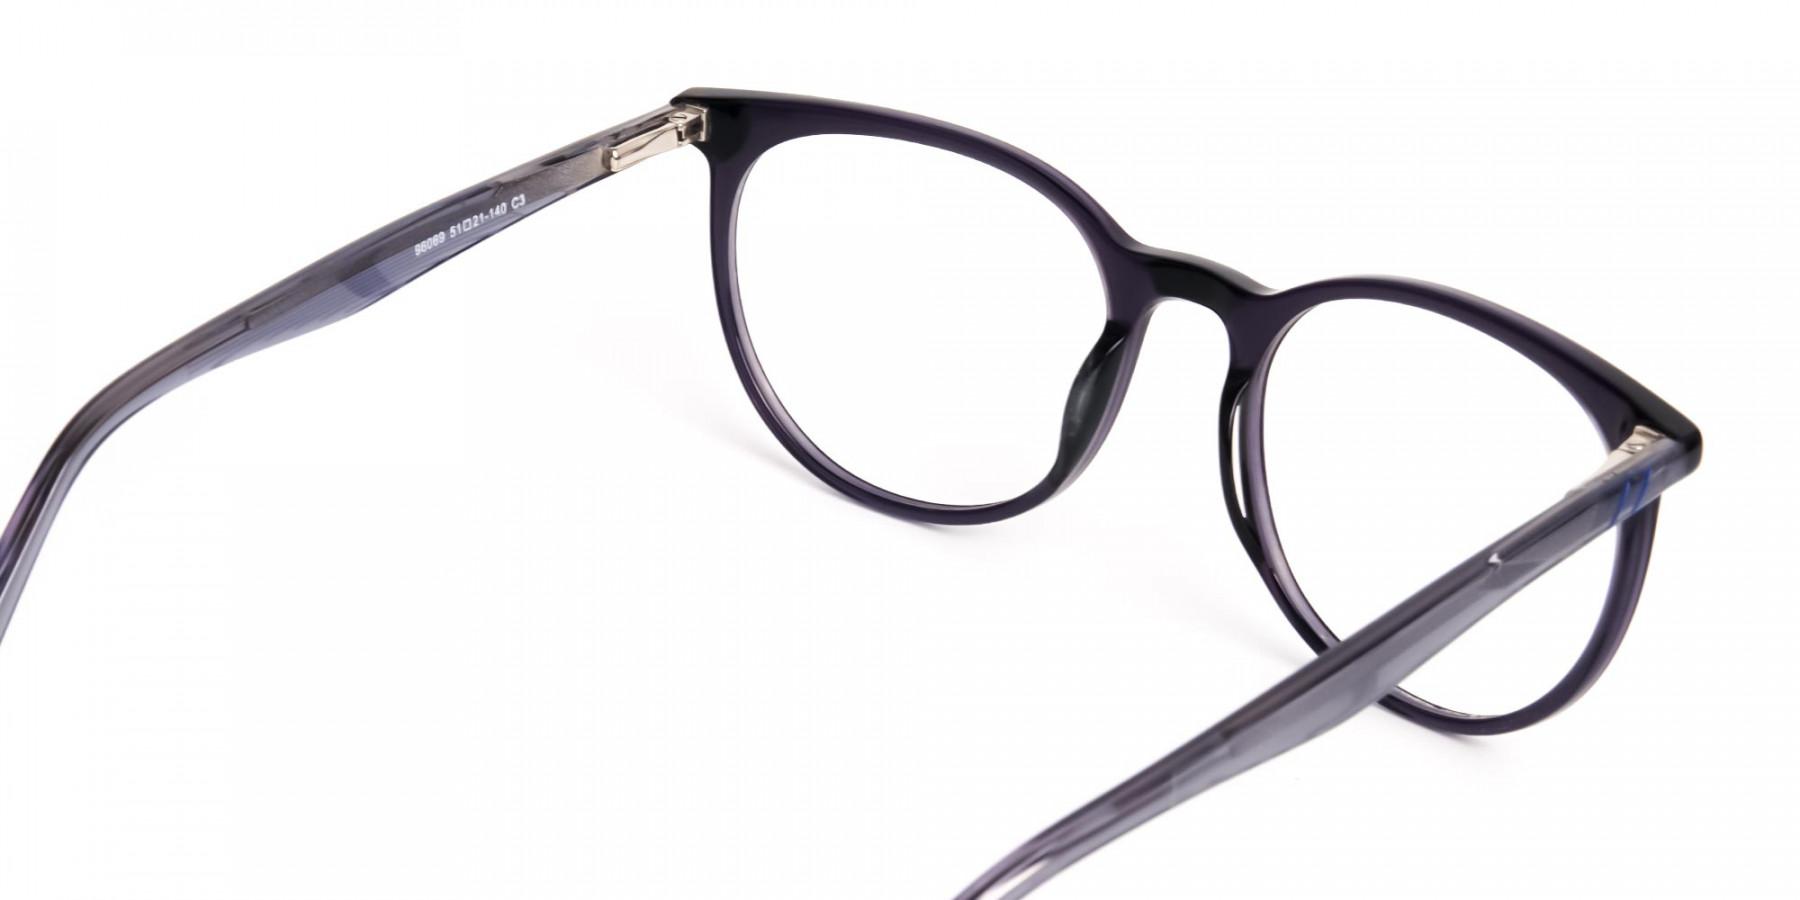 space-grey-designer-round-glasses-frames-1